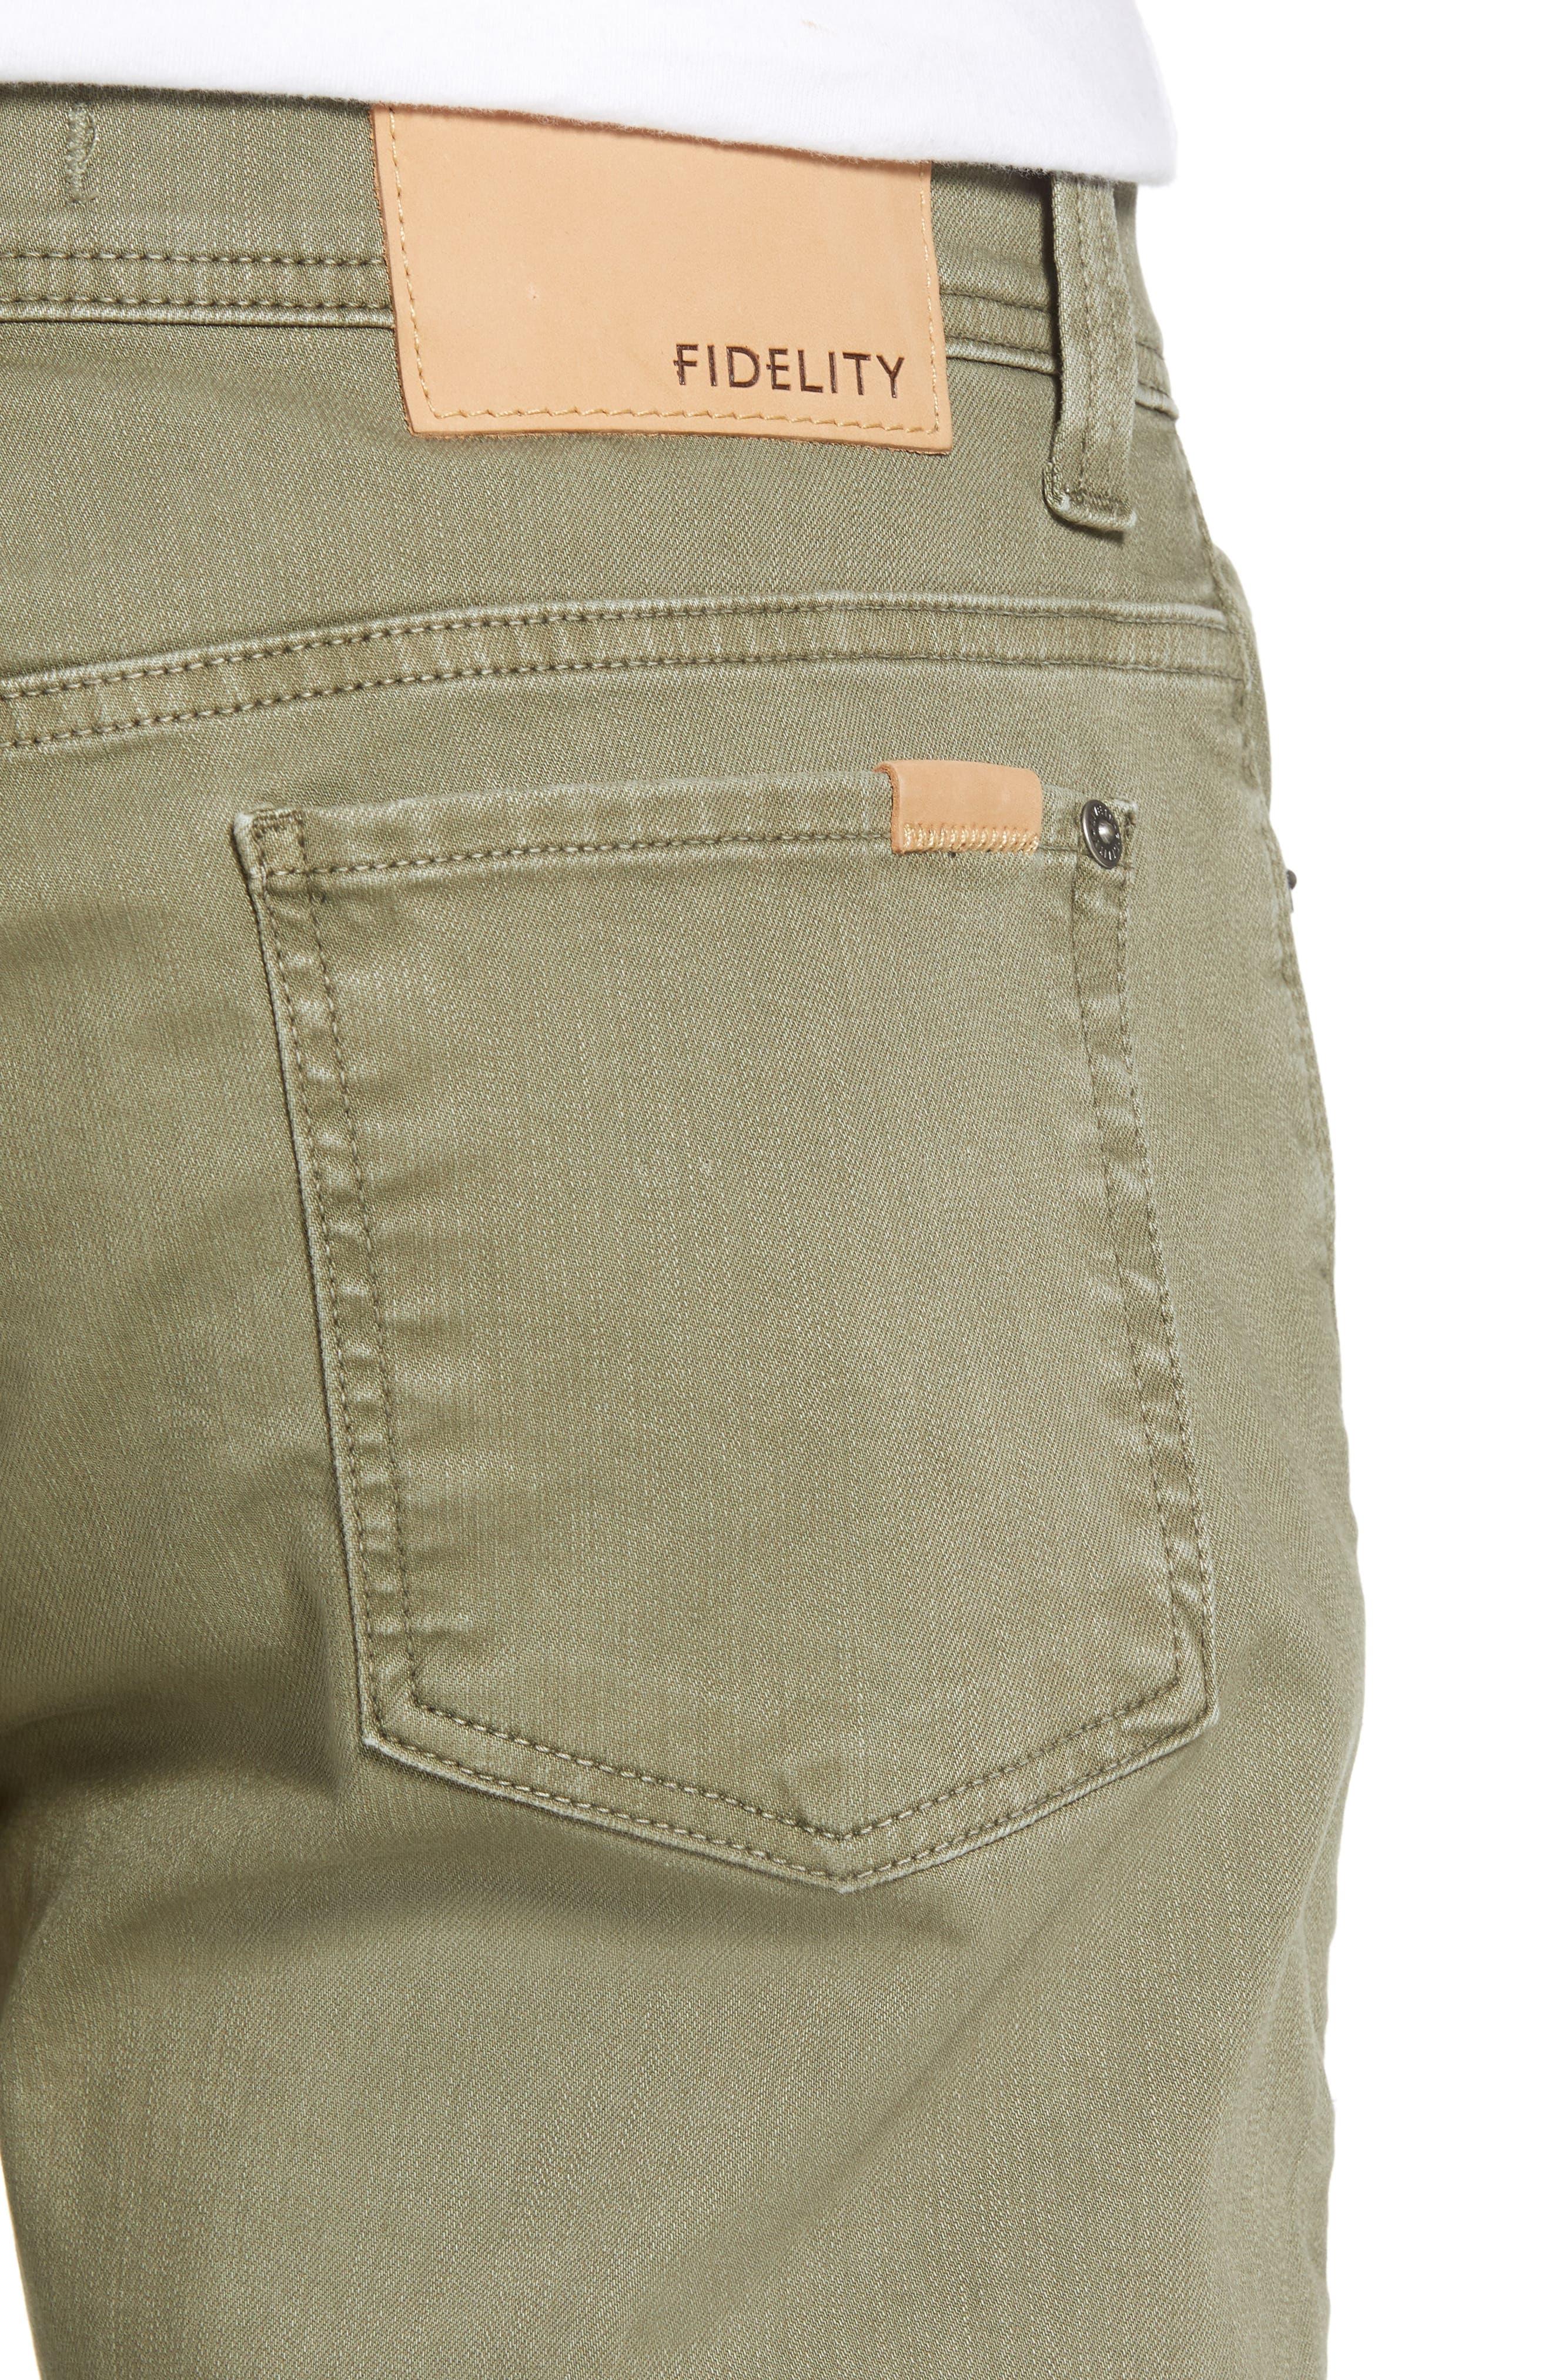 Jimmy Slim Straight Leg Jeans,                             Alternate thumbnail 4, color,                             300